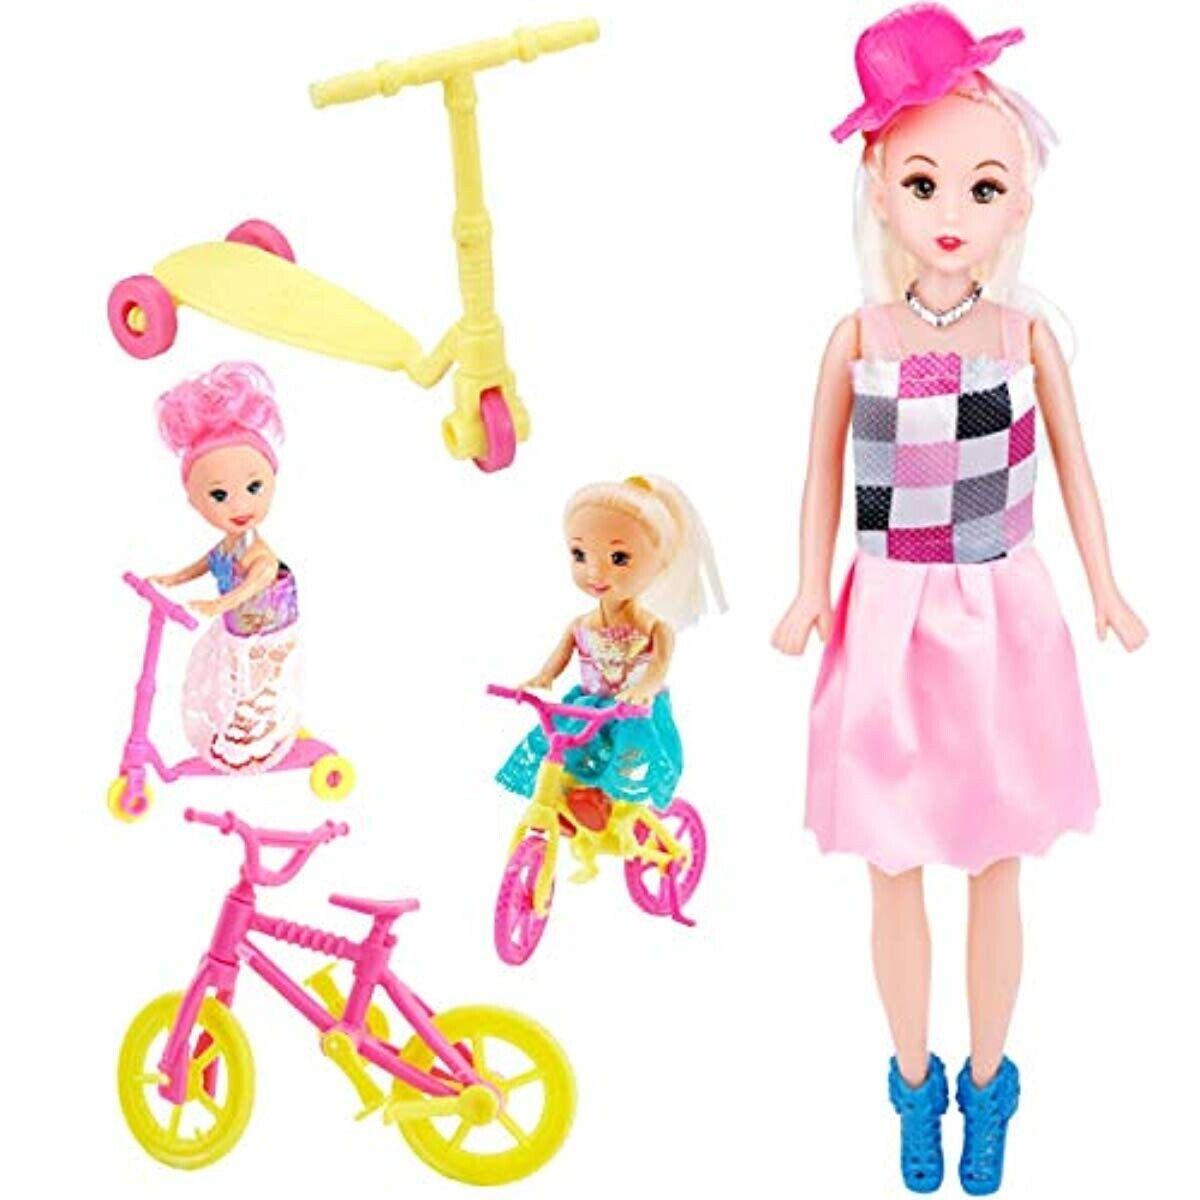 73PCS Barbie Doll Clothes Party Gown Shoes Bag Necklace Hanger Doll Accessories 5